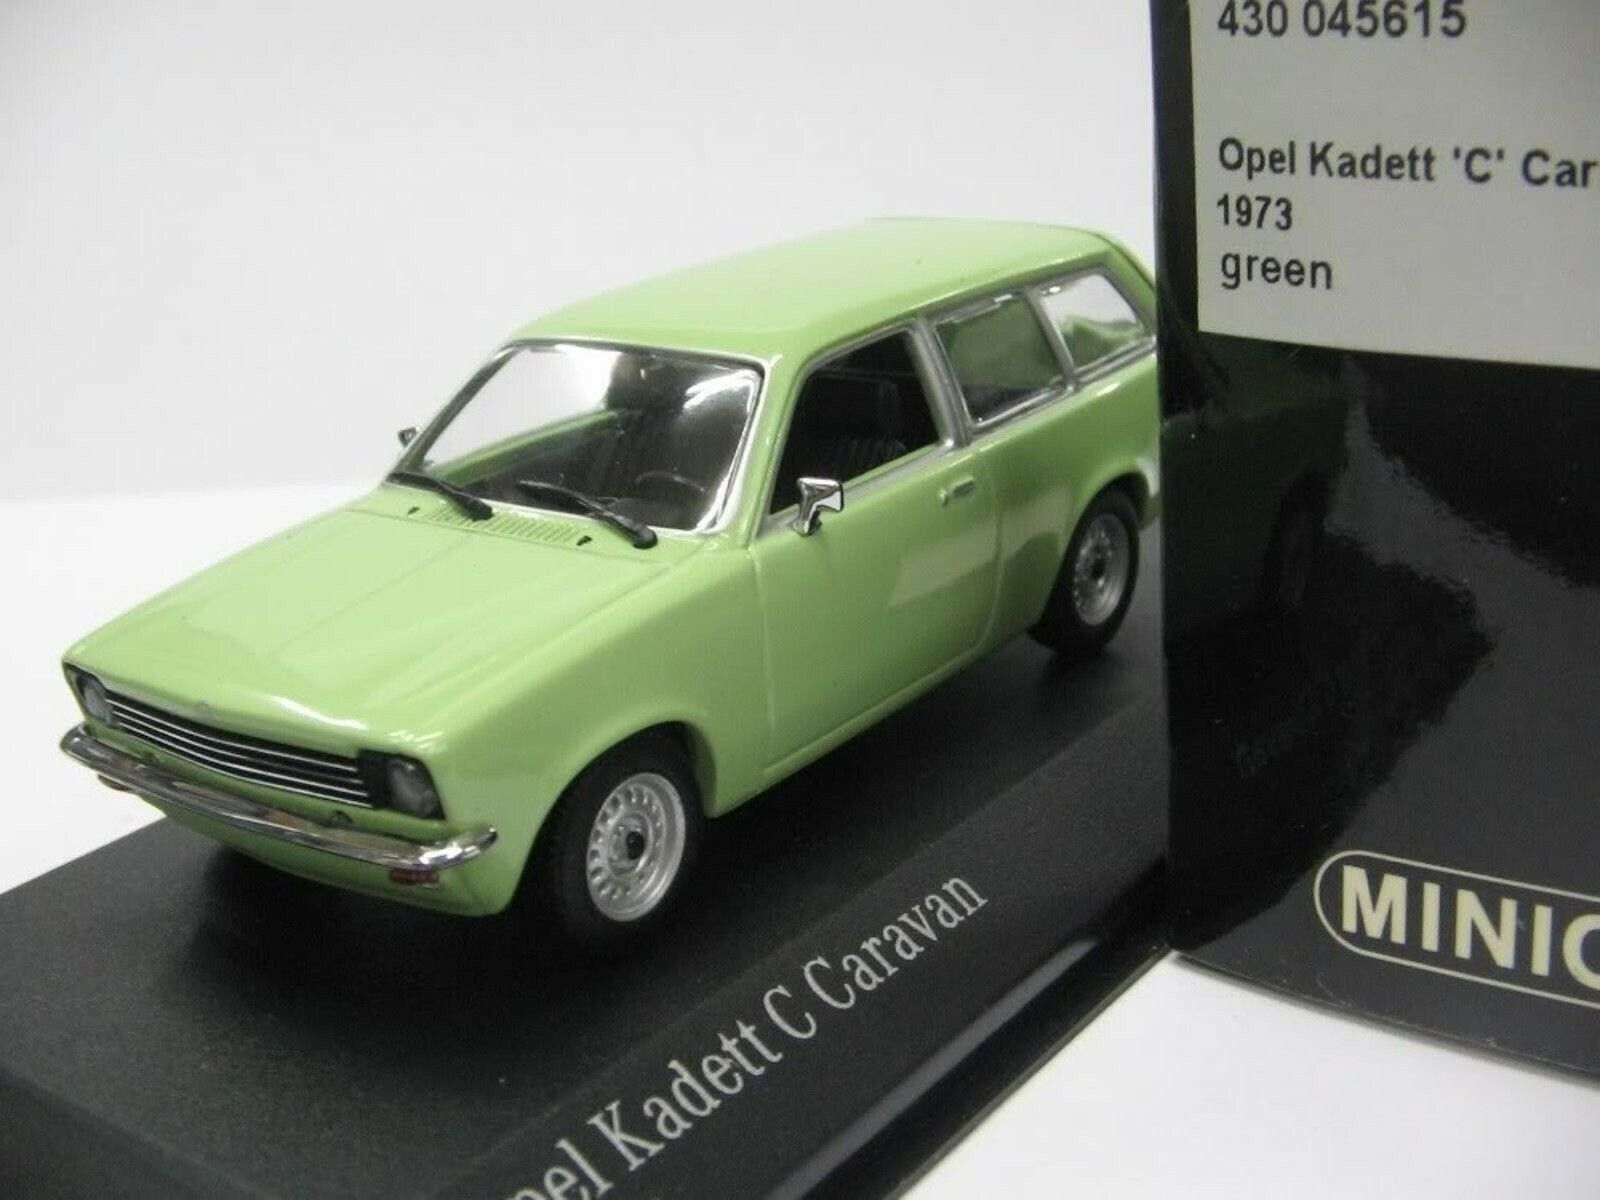 WOW estremamente raro OPEL KADETT C CARAVAN 1974 Lime verde 1 43 Minichamps-REKORD